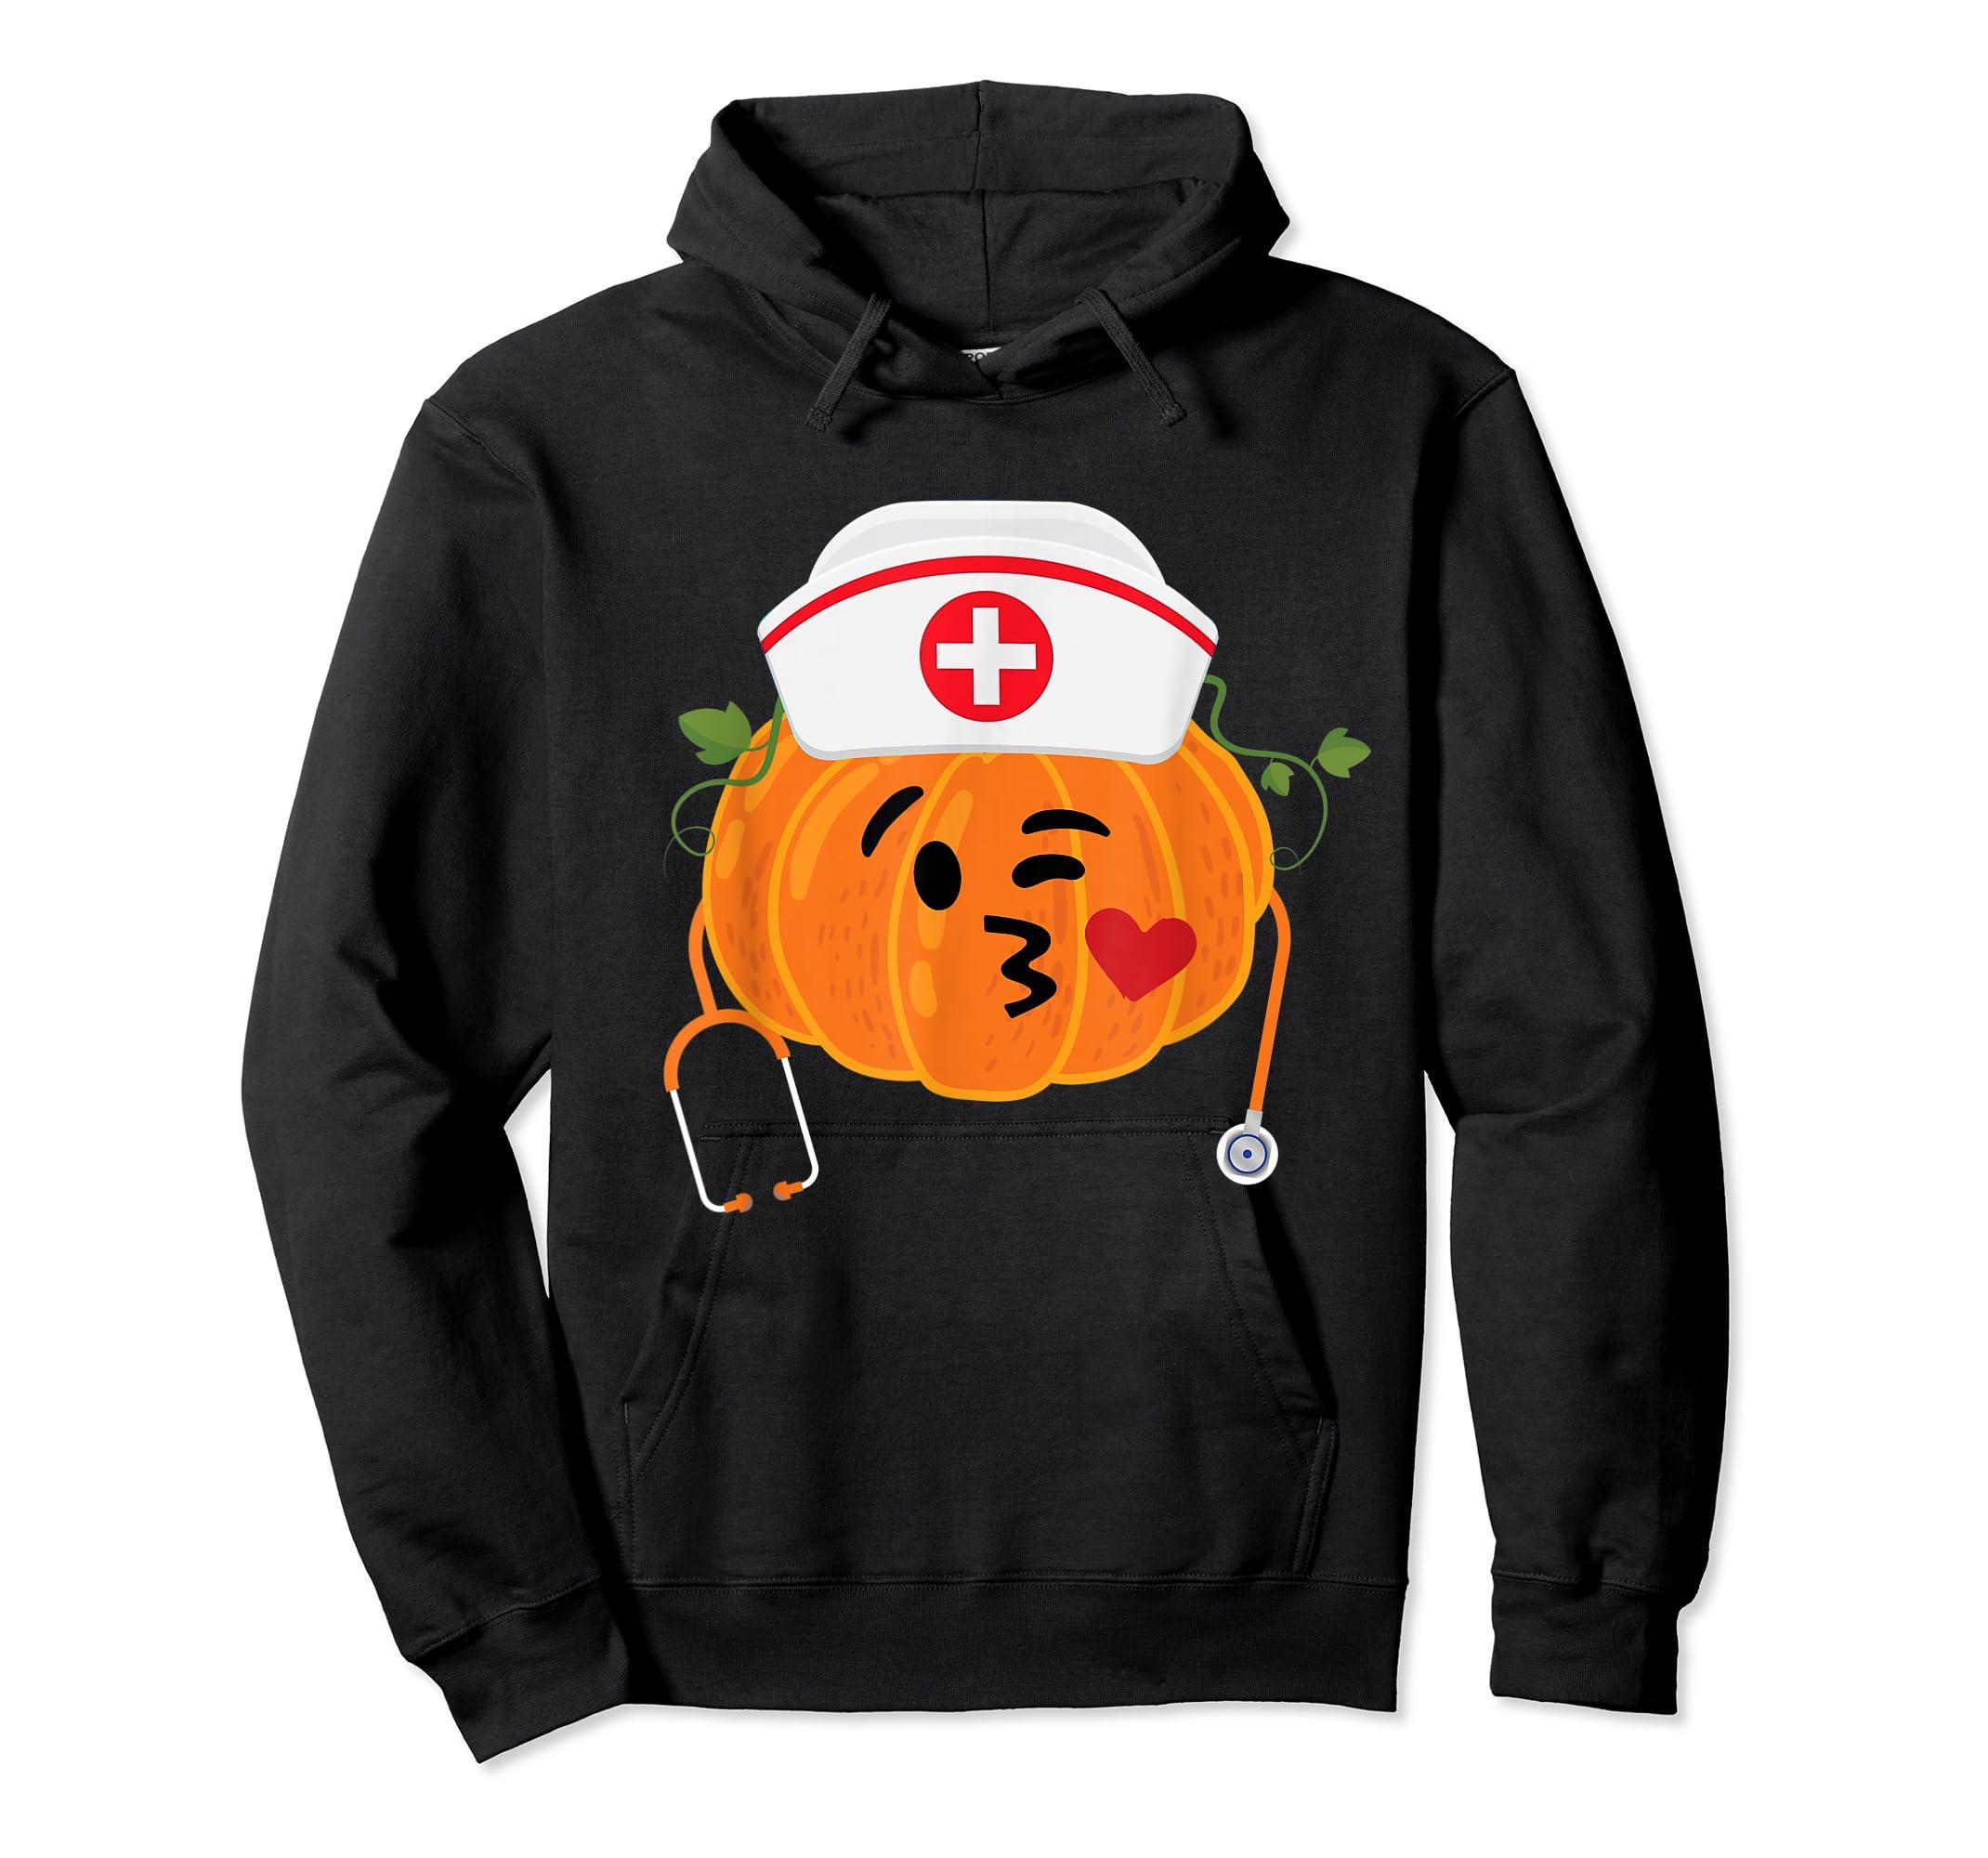 Nurse Stethoscope Pumpkin Funny Nursing Halloween Gift T-Shirt-Hoodie-Black